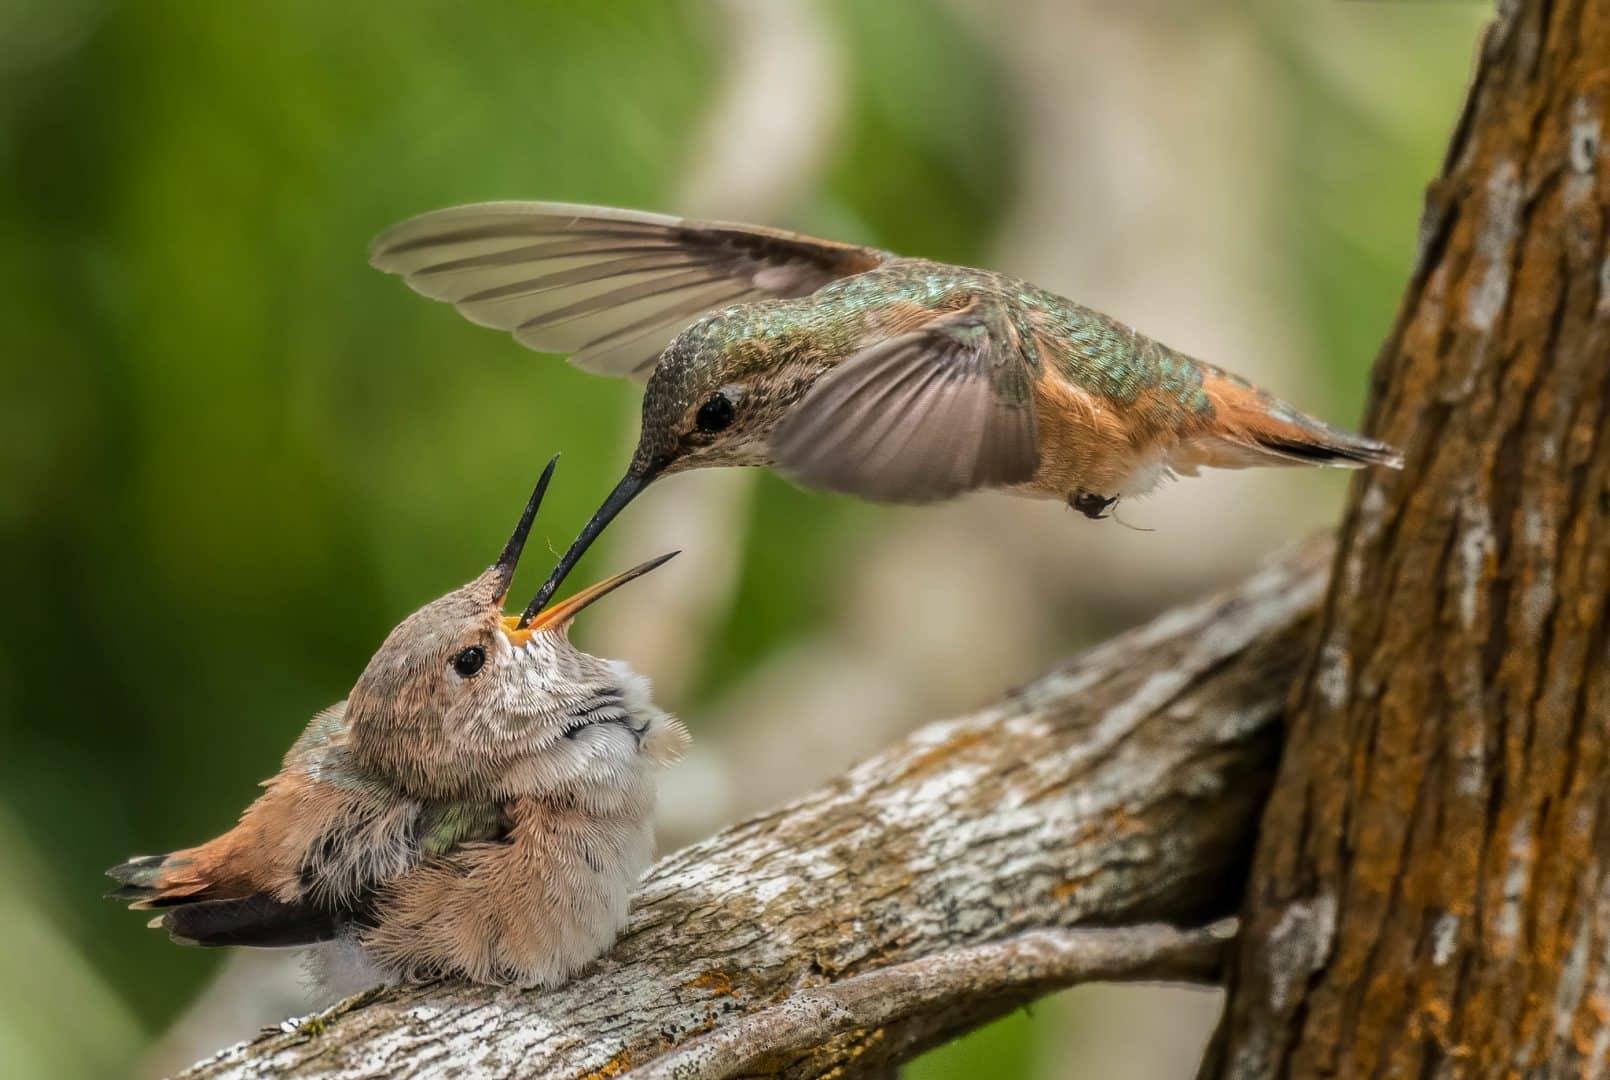 Beija-flor - características e curiosidades sobre o menor pássaro do mundo